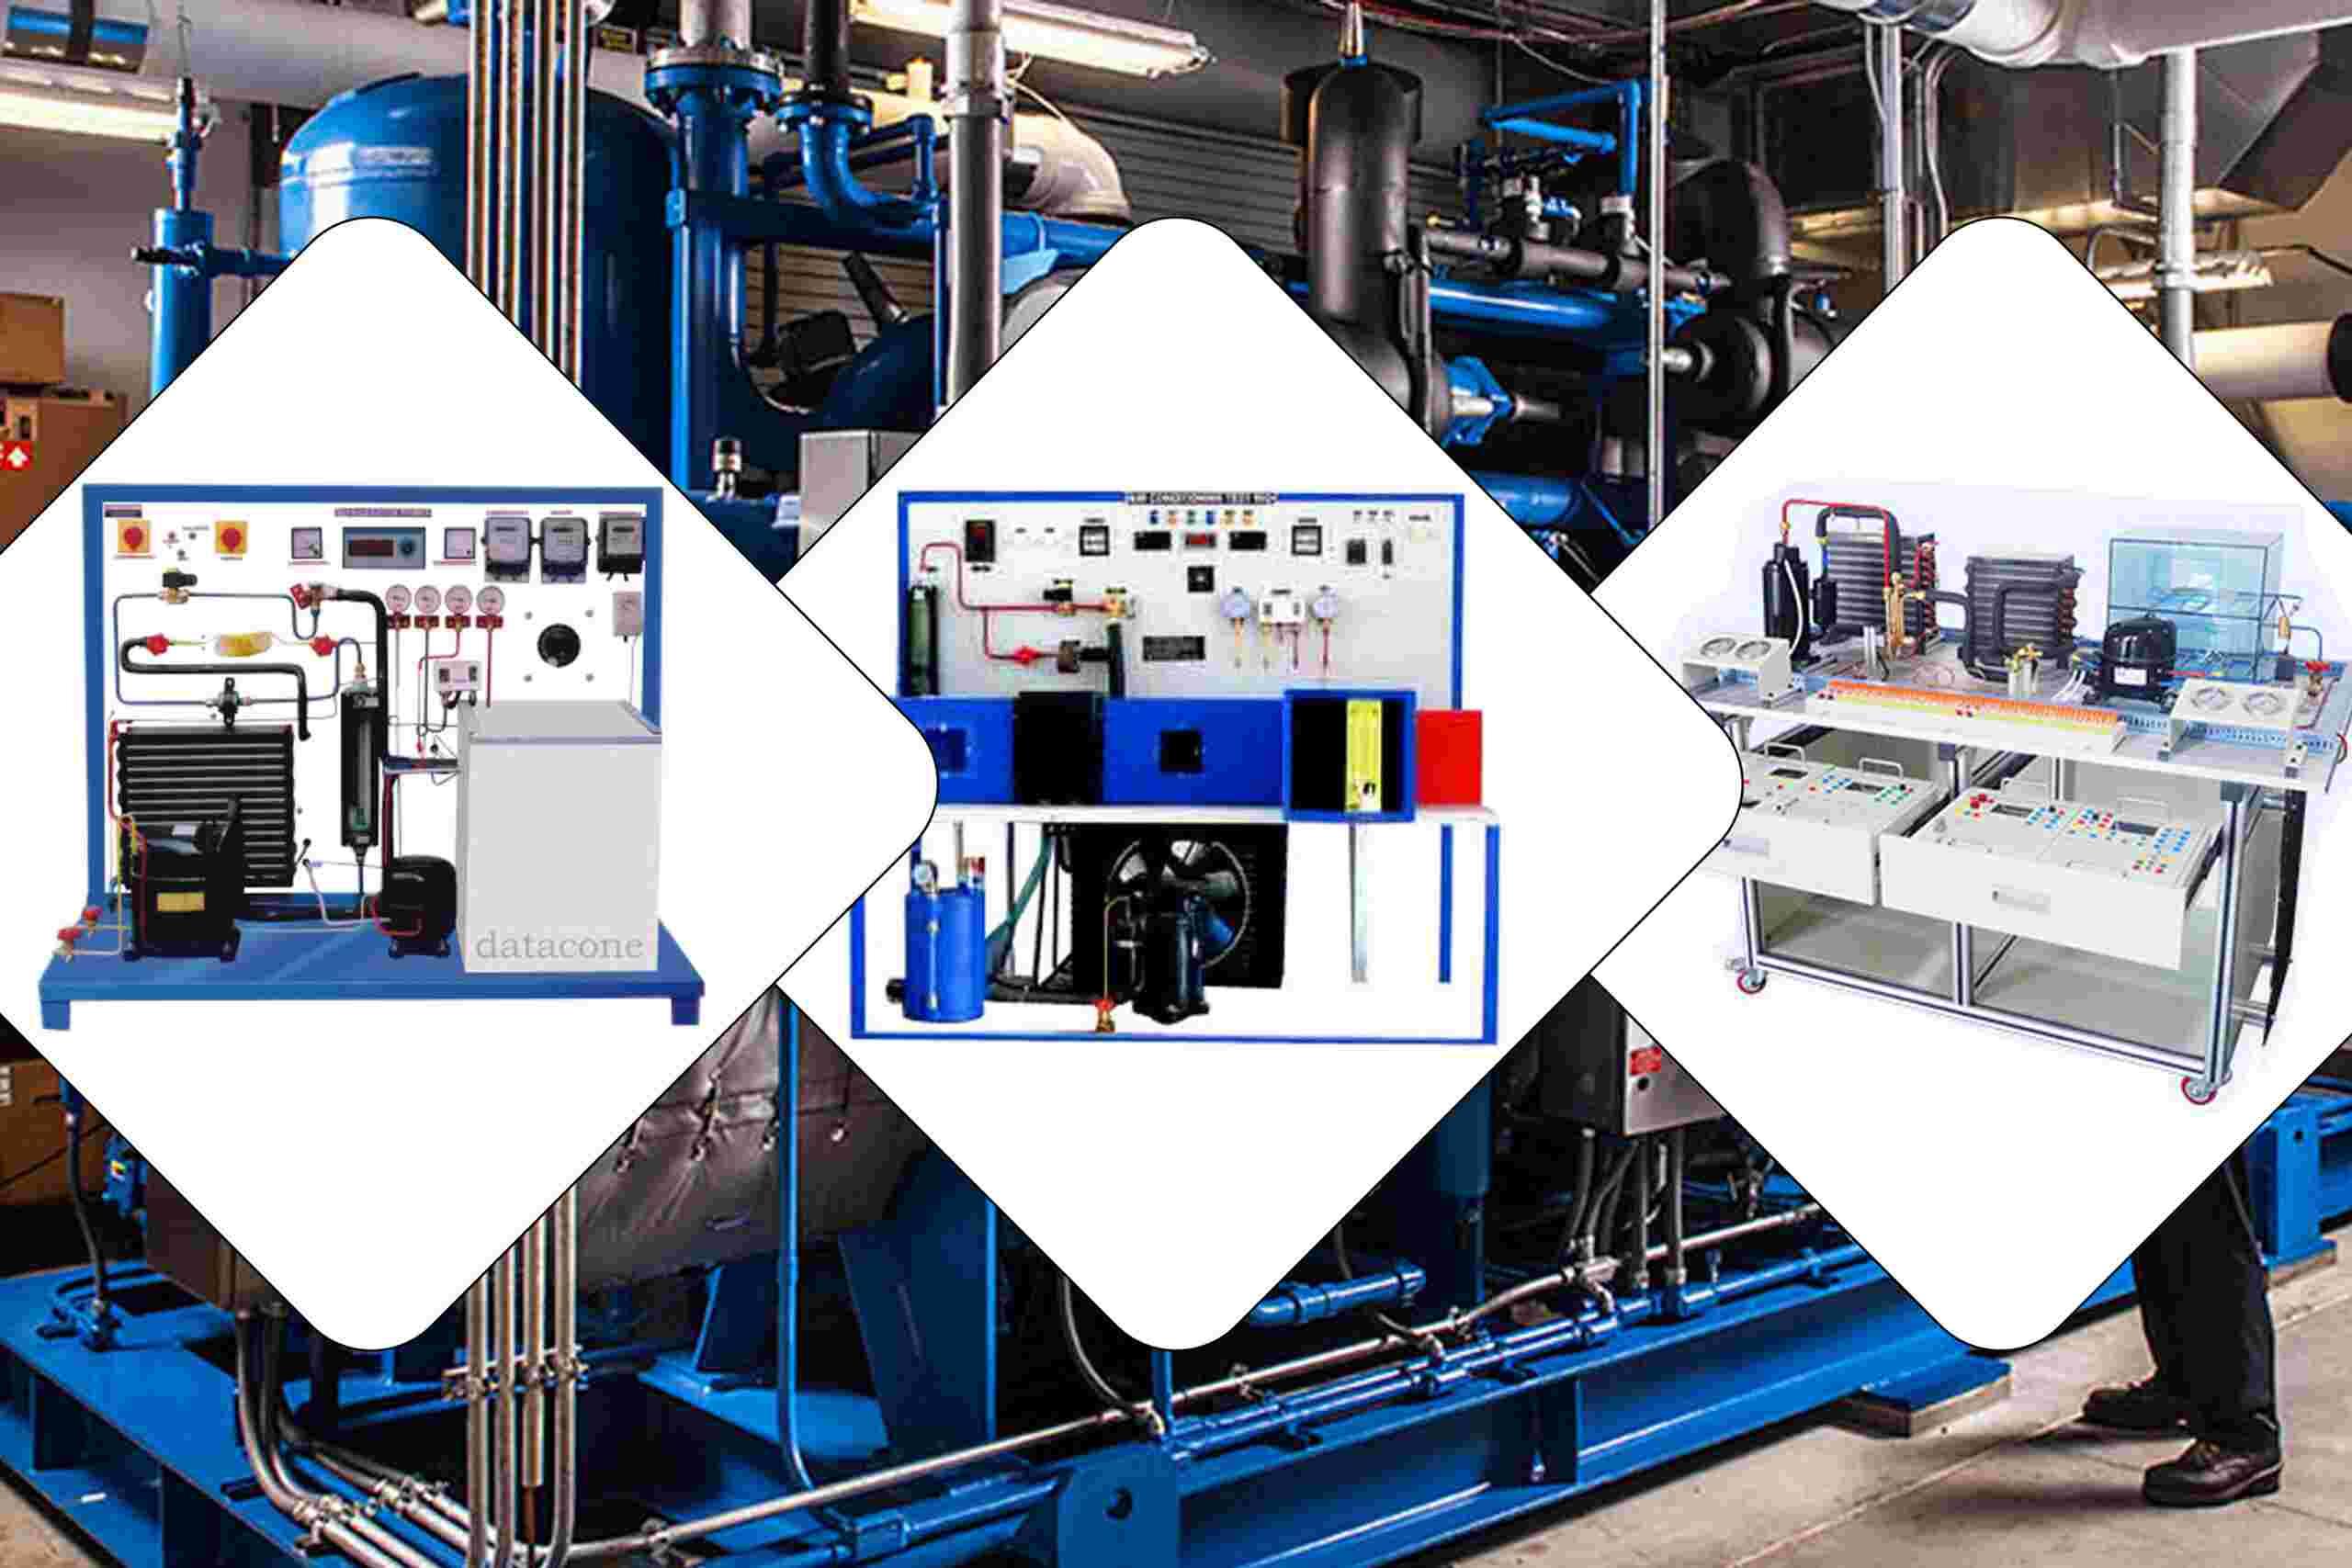 Refrigeration & Air Condition Lab Equipment